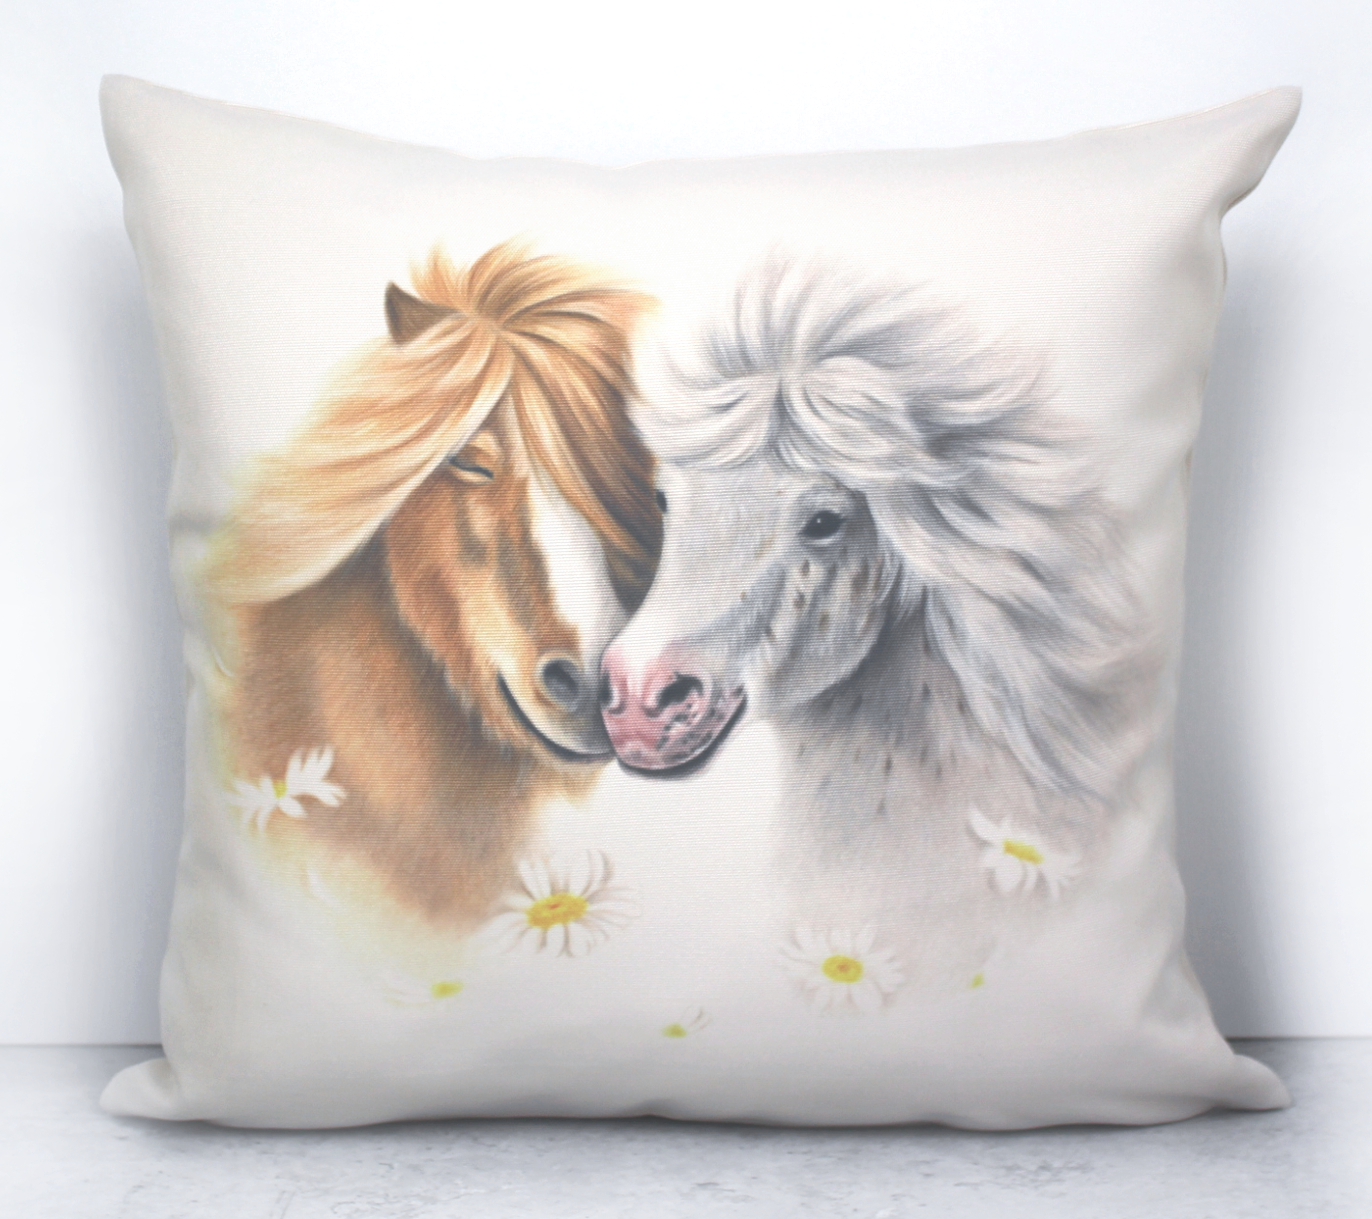 Ponipari ja Kukat -Sisustustyyny (Hevonen)